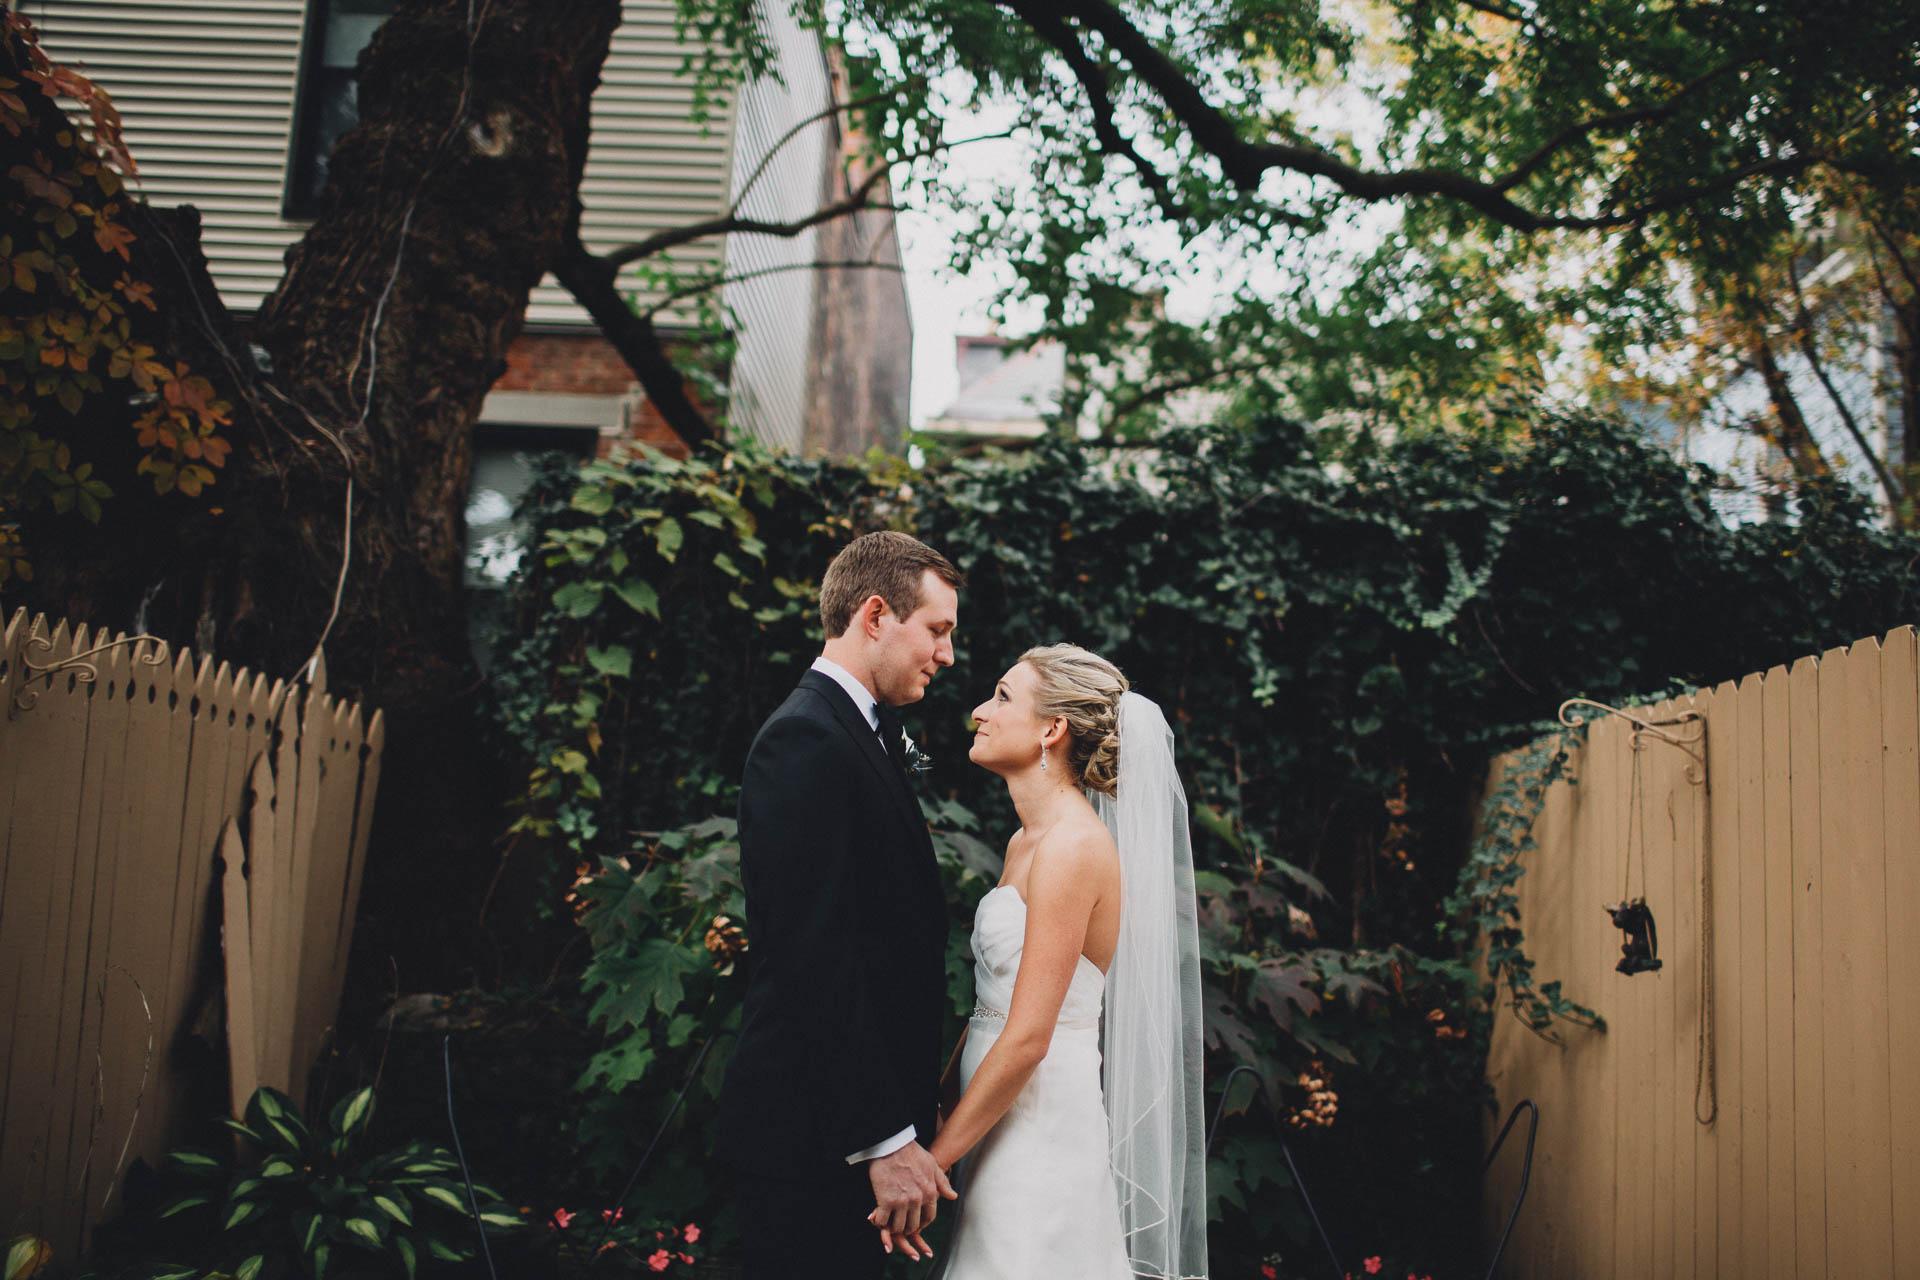 EC-Modern-Cincinnati-Wedding-053@2x.jpg